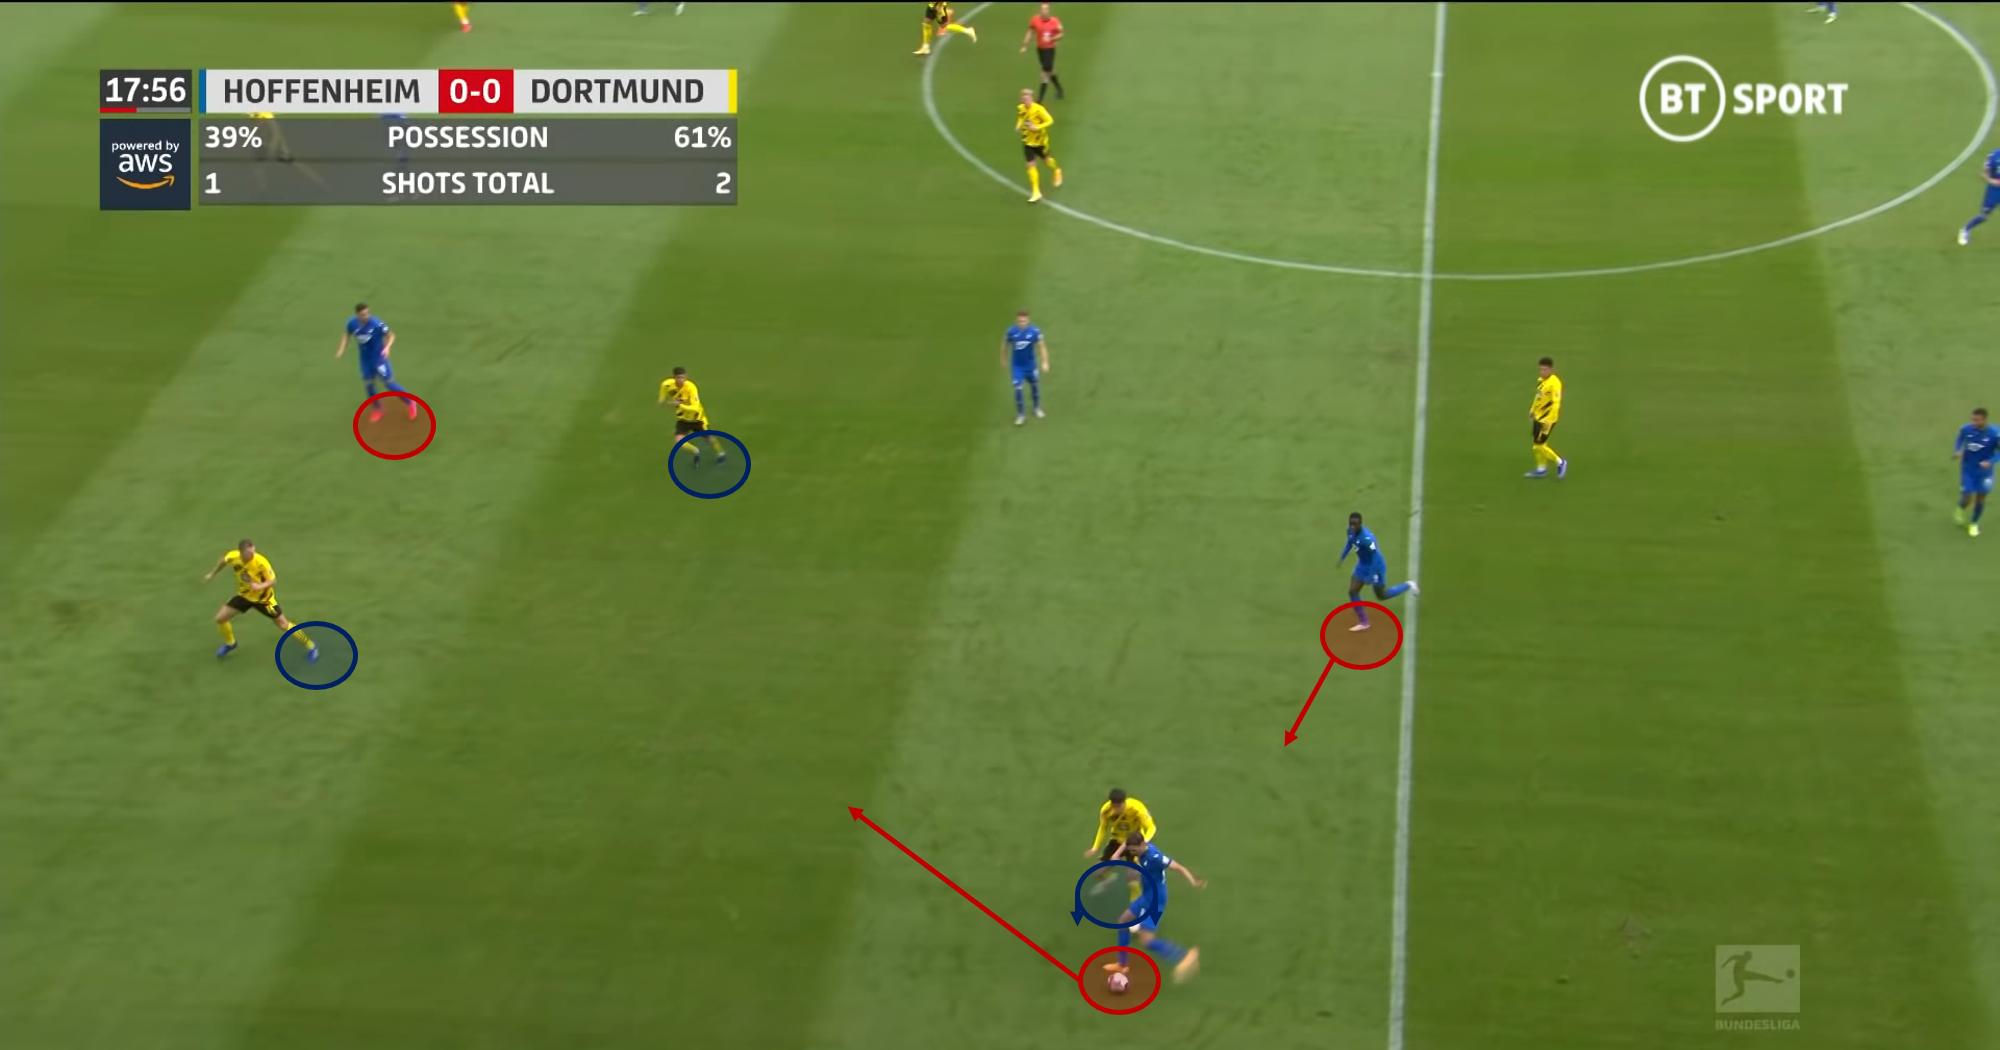 Bundesliga 2020/21: TSG Hoffenheim vs Borussia Dortmund – tactical analysis - tactics